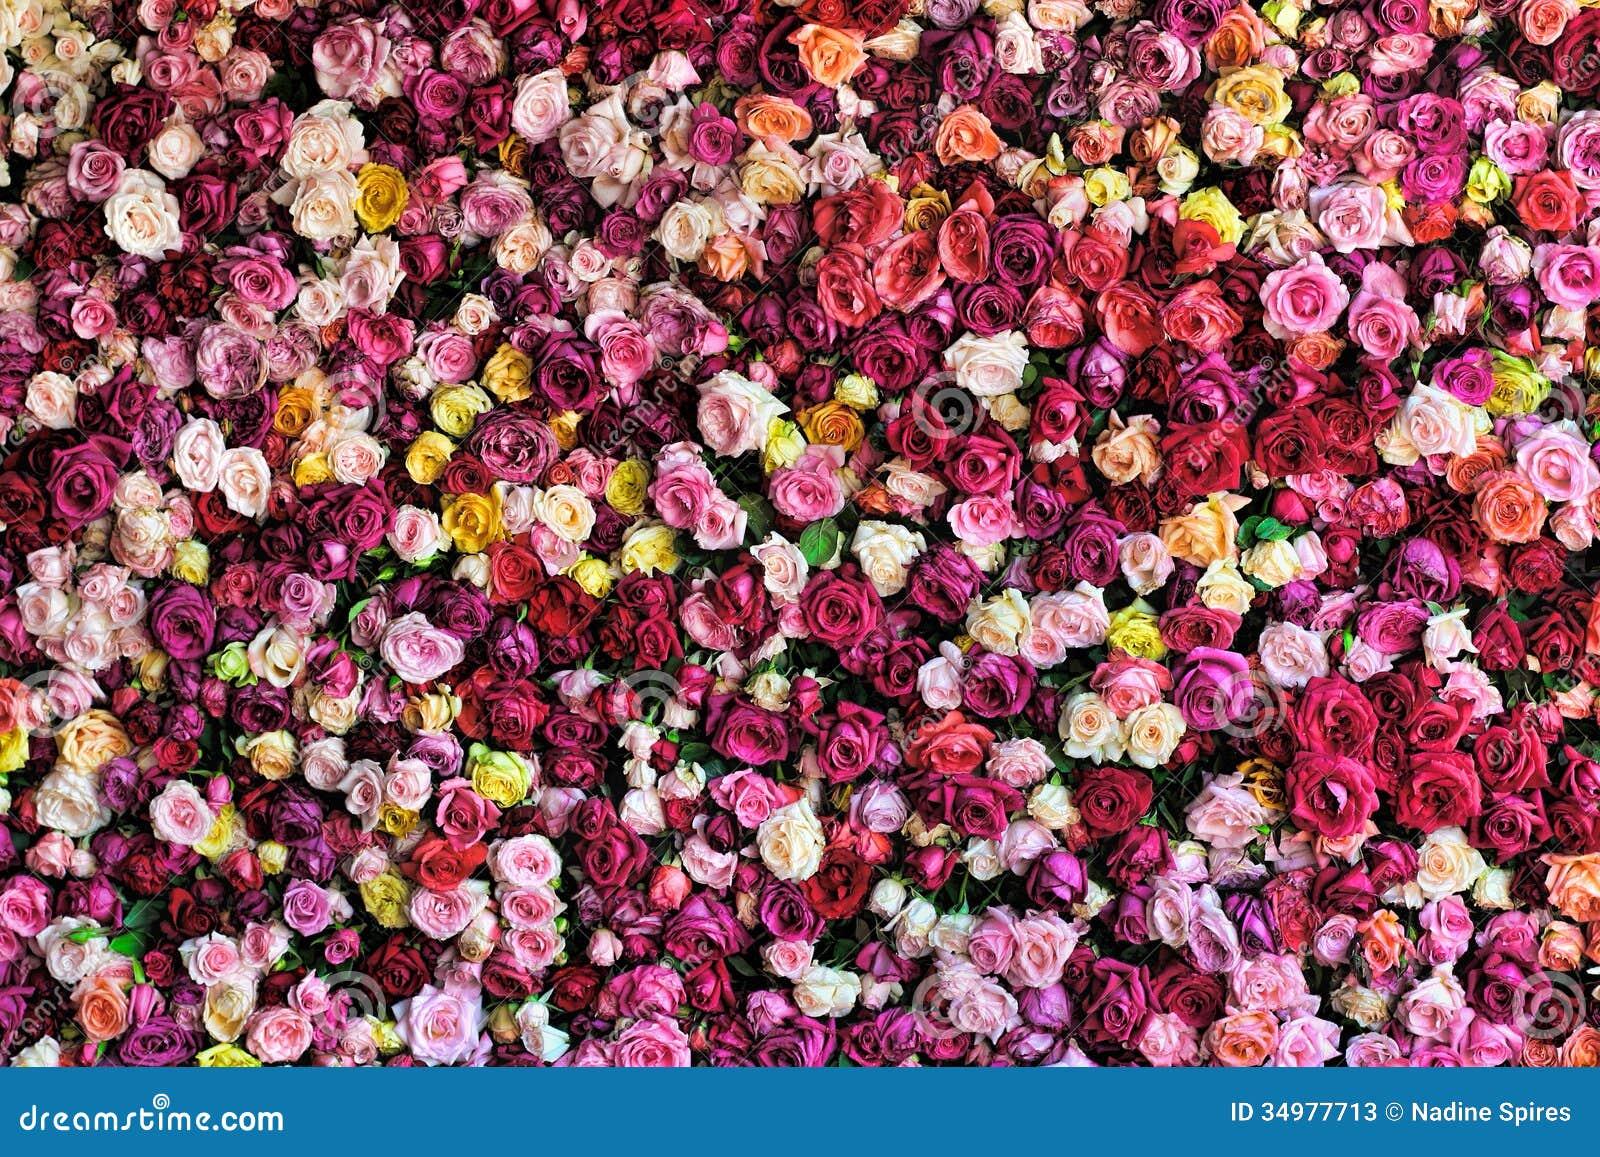 Colourful rose background stock photos image 34977713